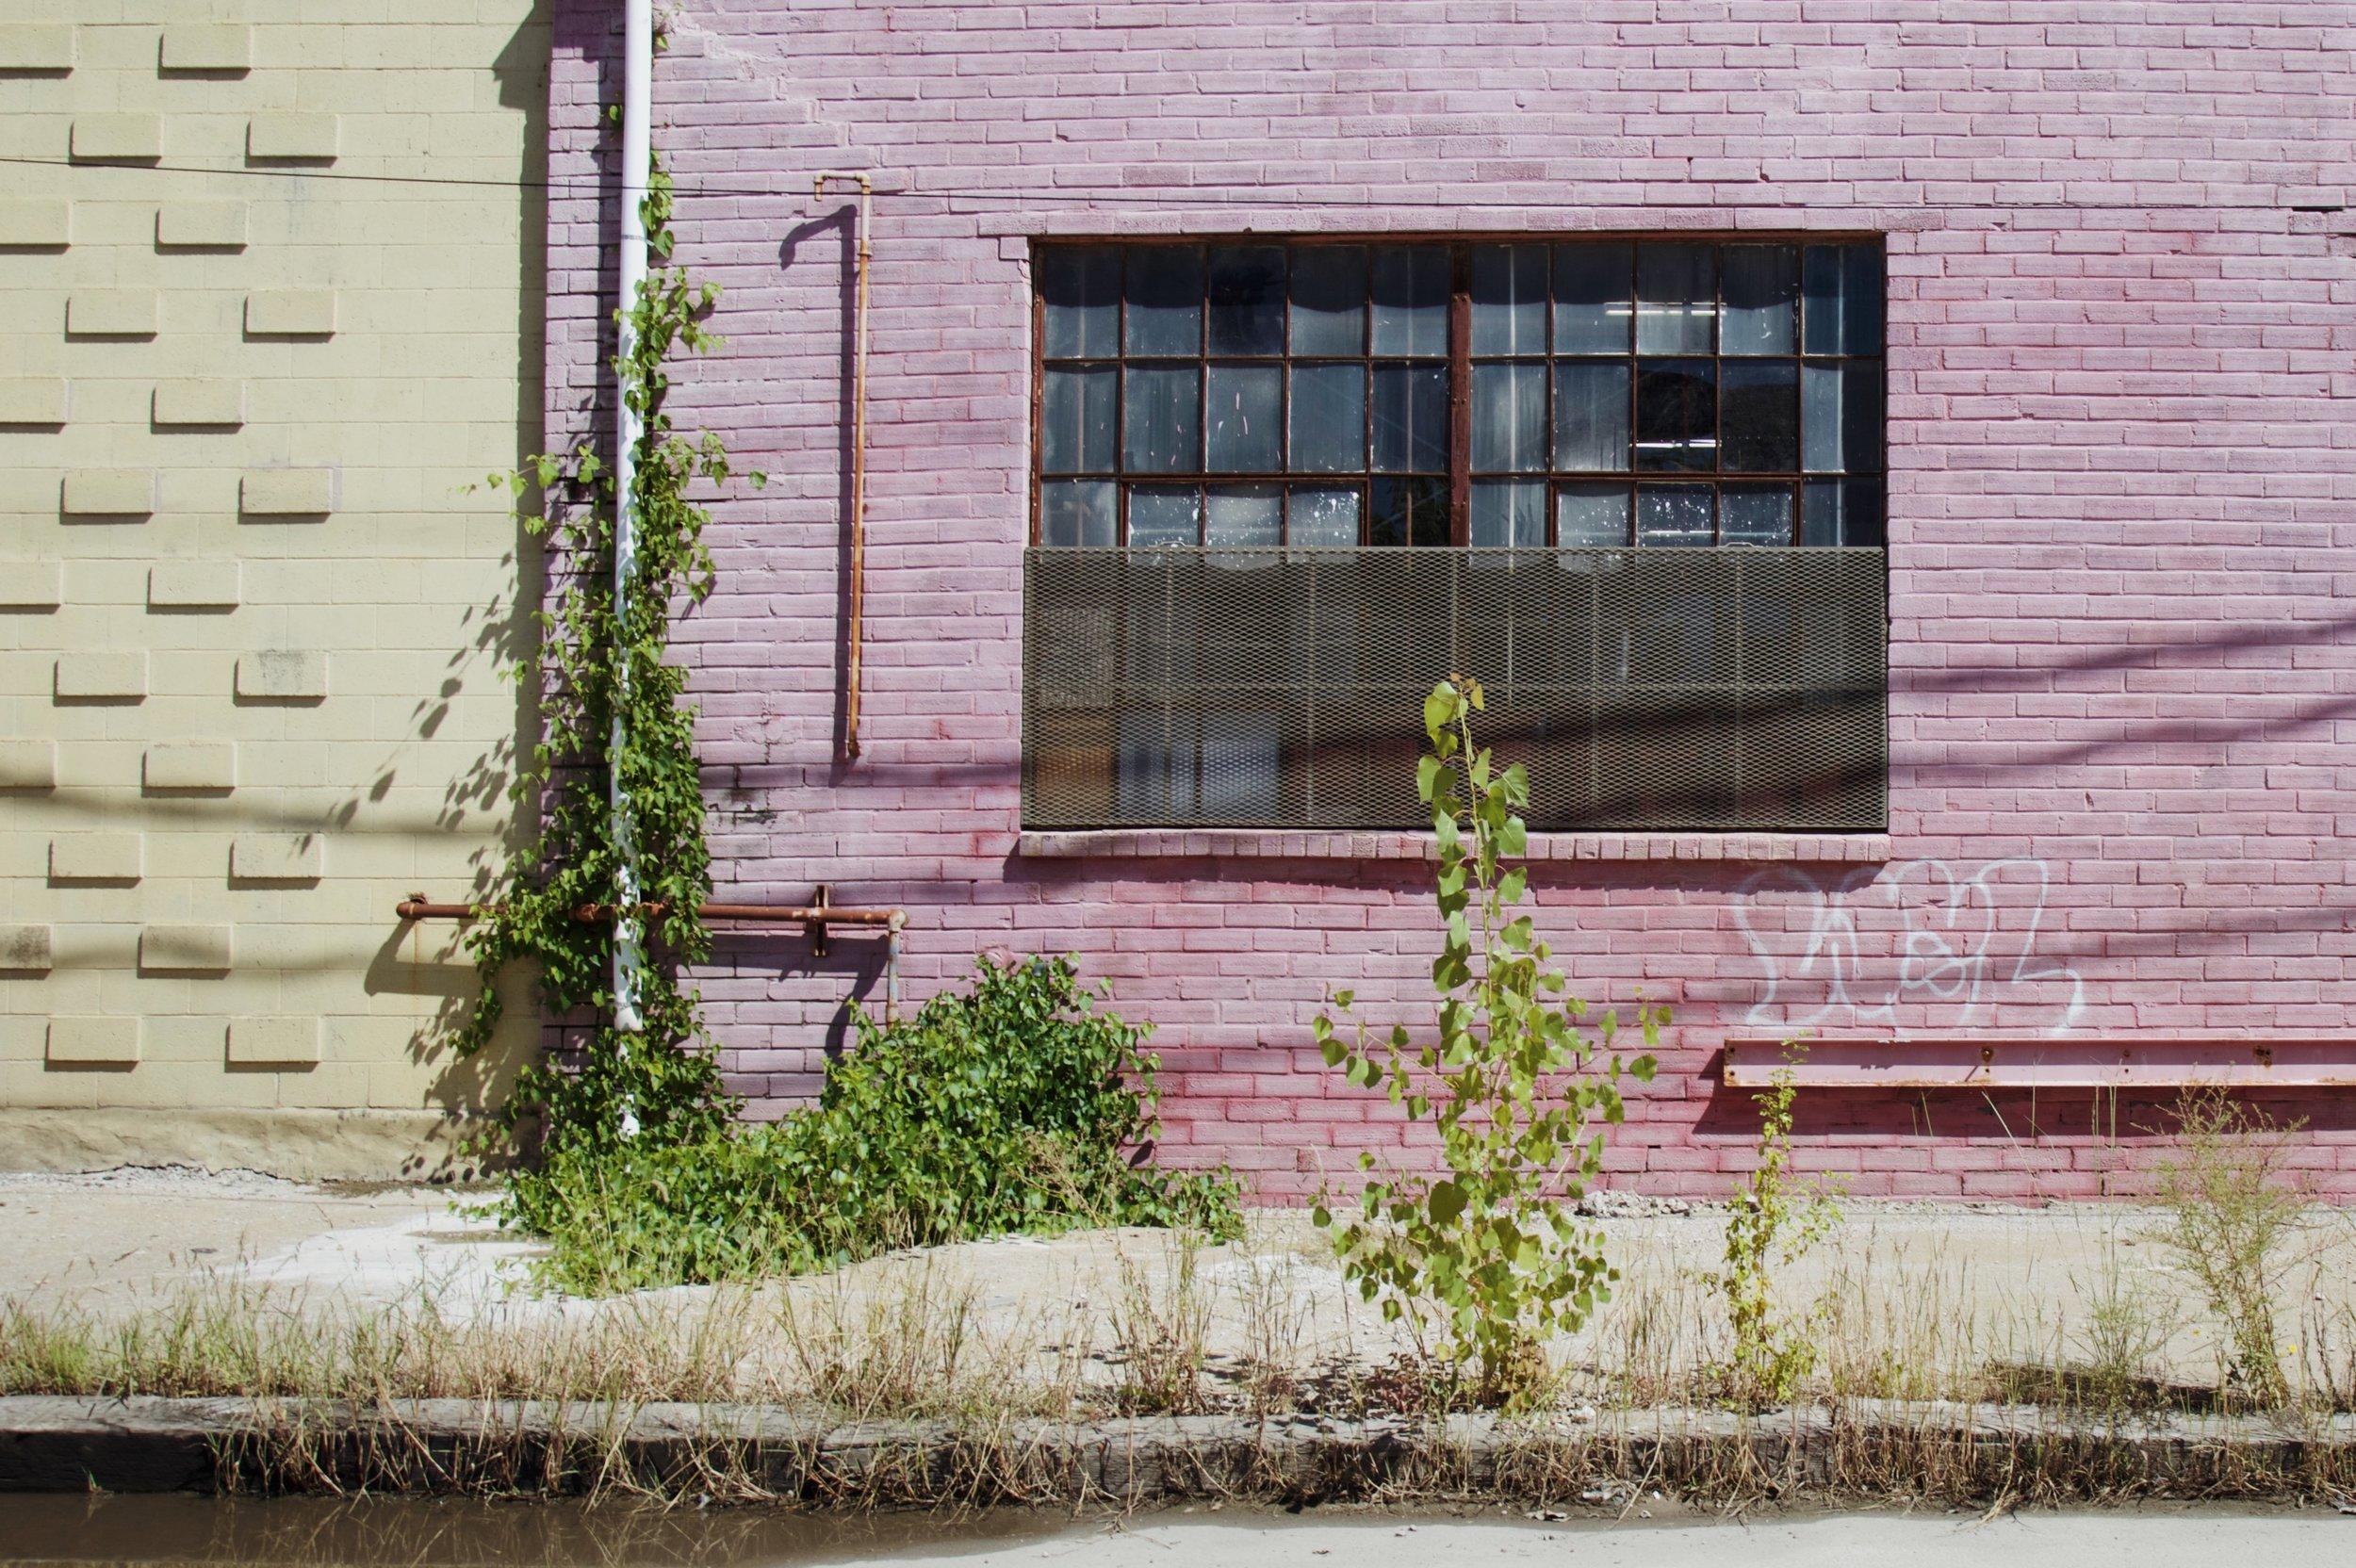 Pink_WestBottoms.JPG